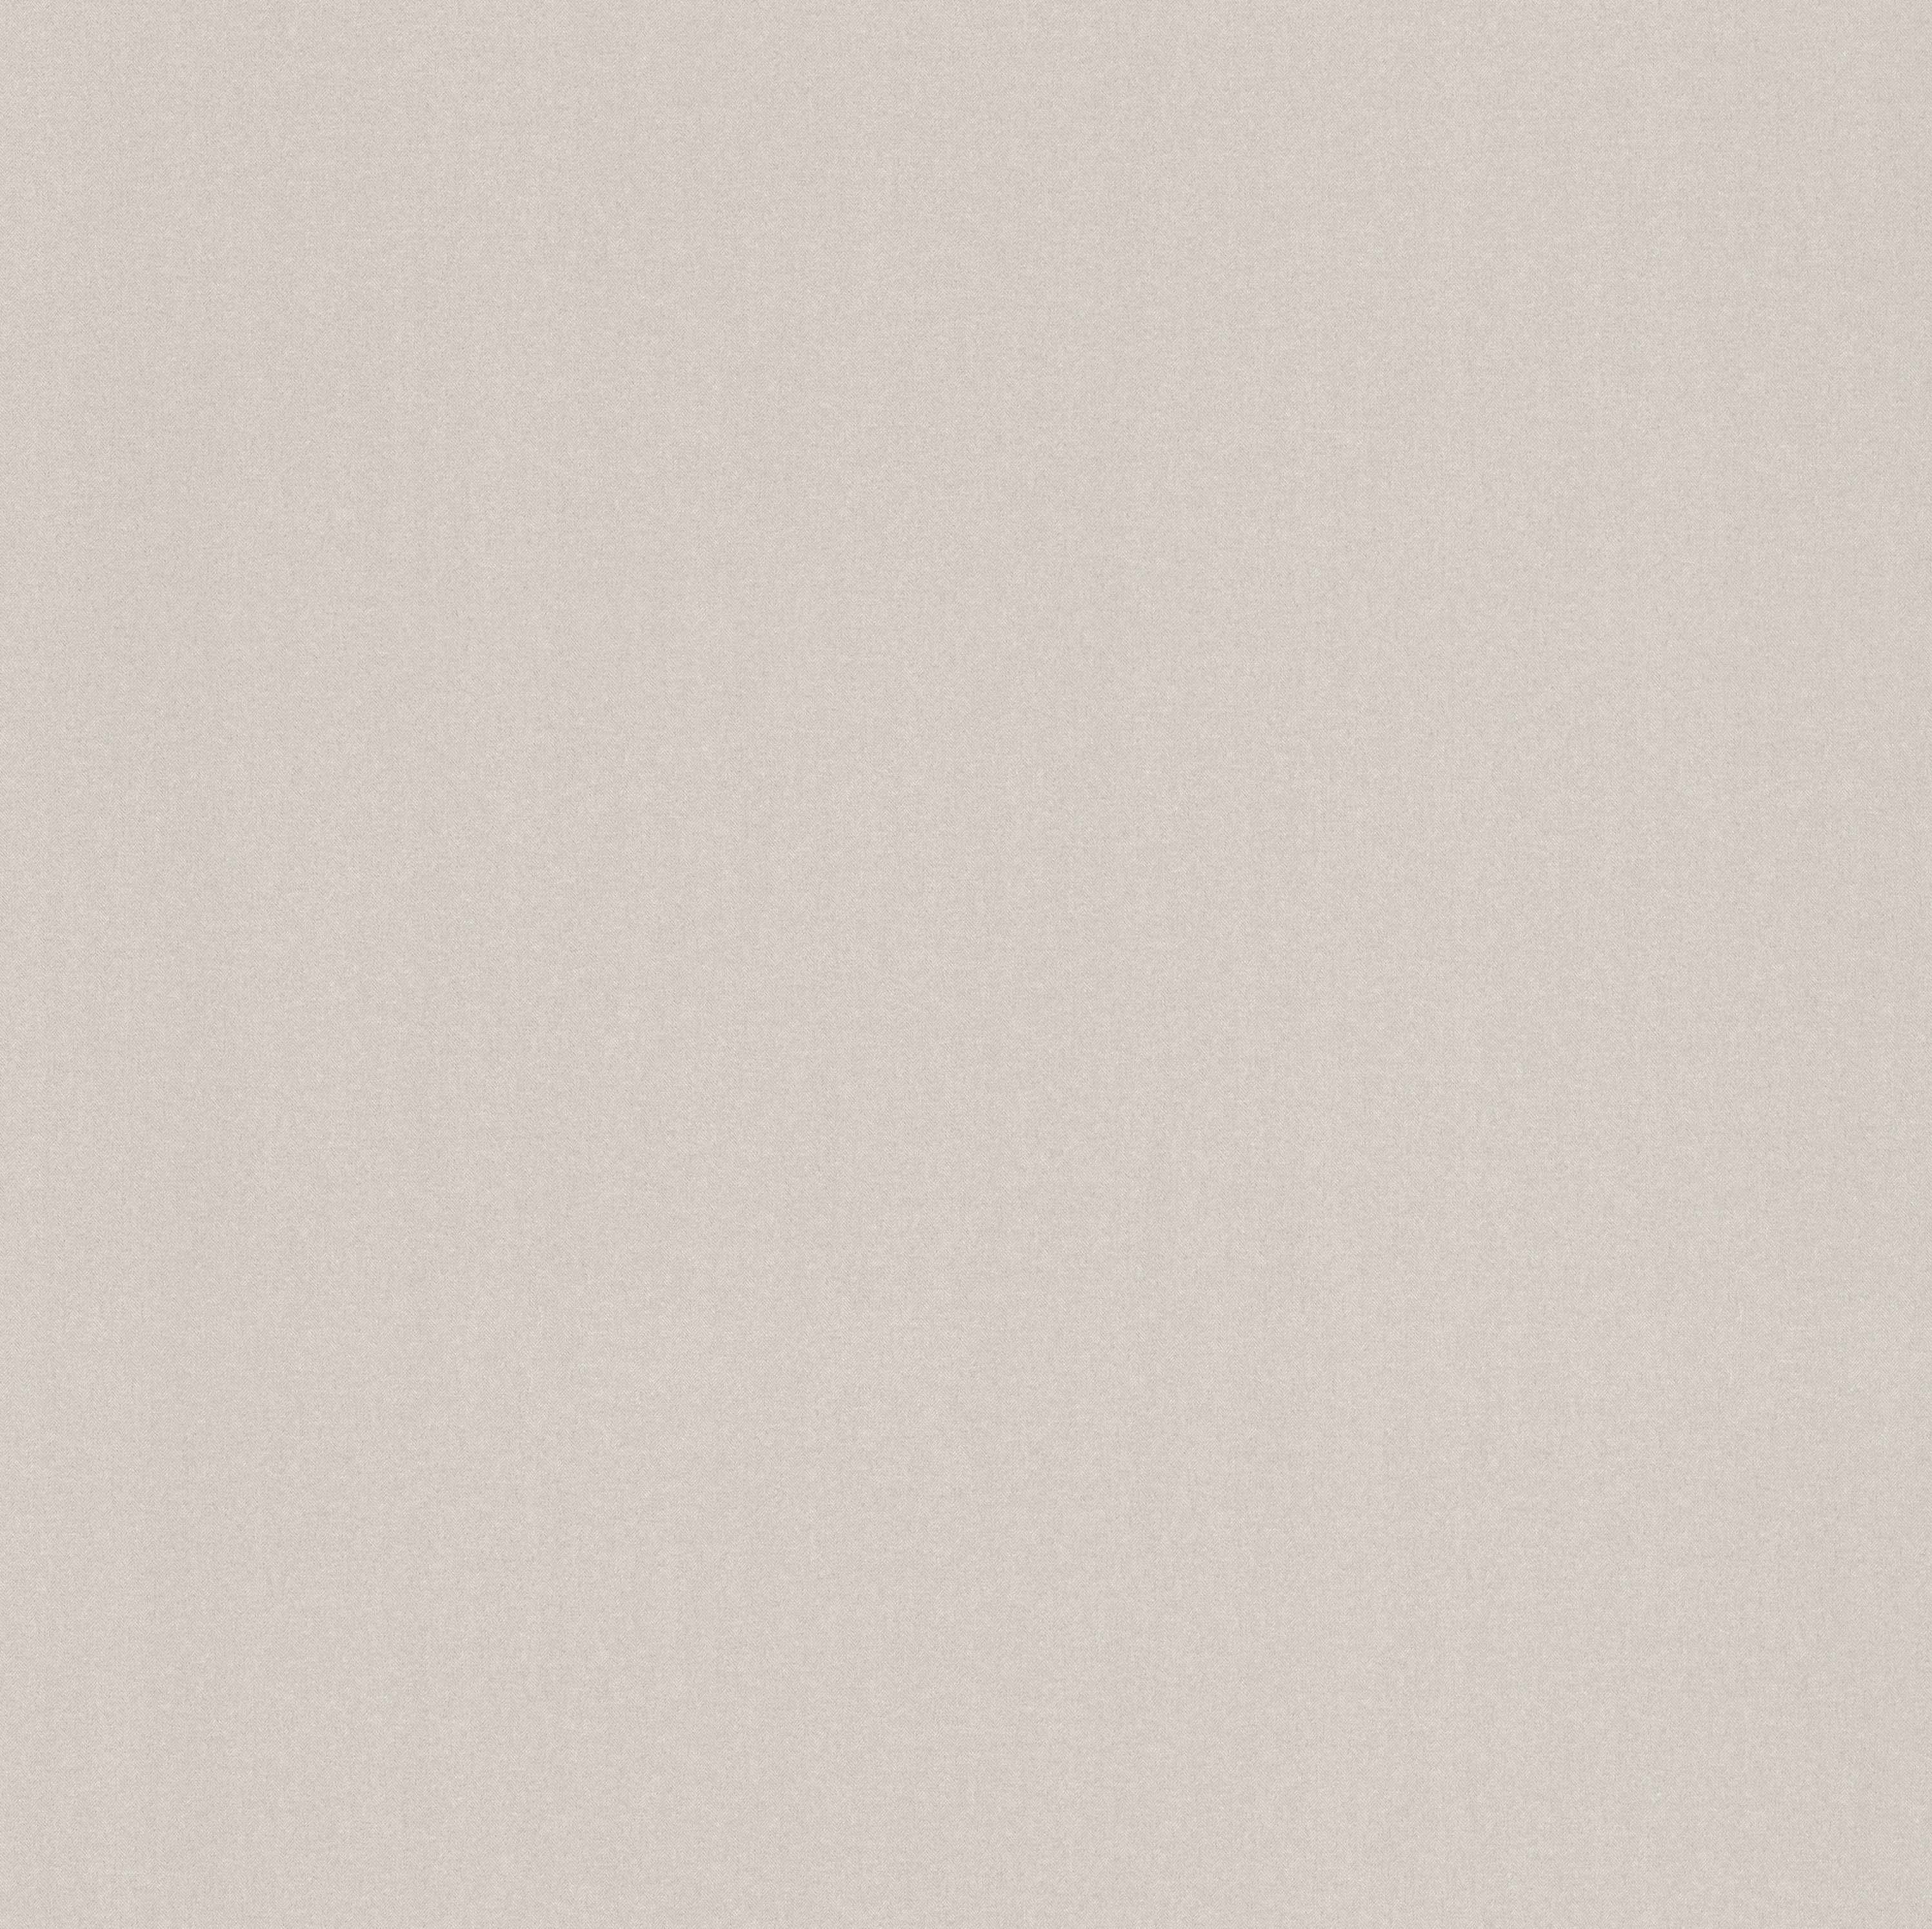 Fimapalst Espiga Sal Textil 2440 x 2100 x 6 mm: Productos y servicios   de Maderas Fernández Garrido, S.A.